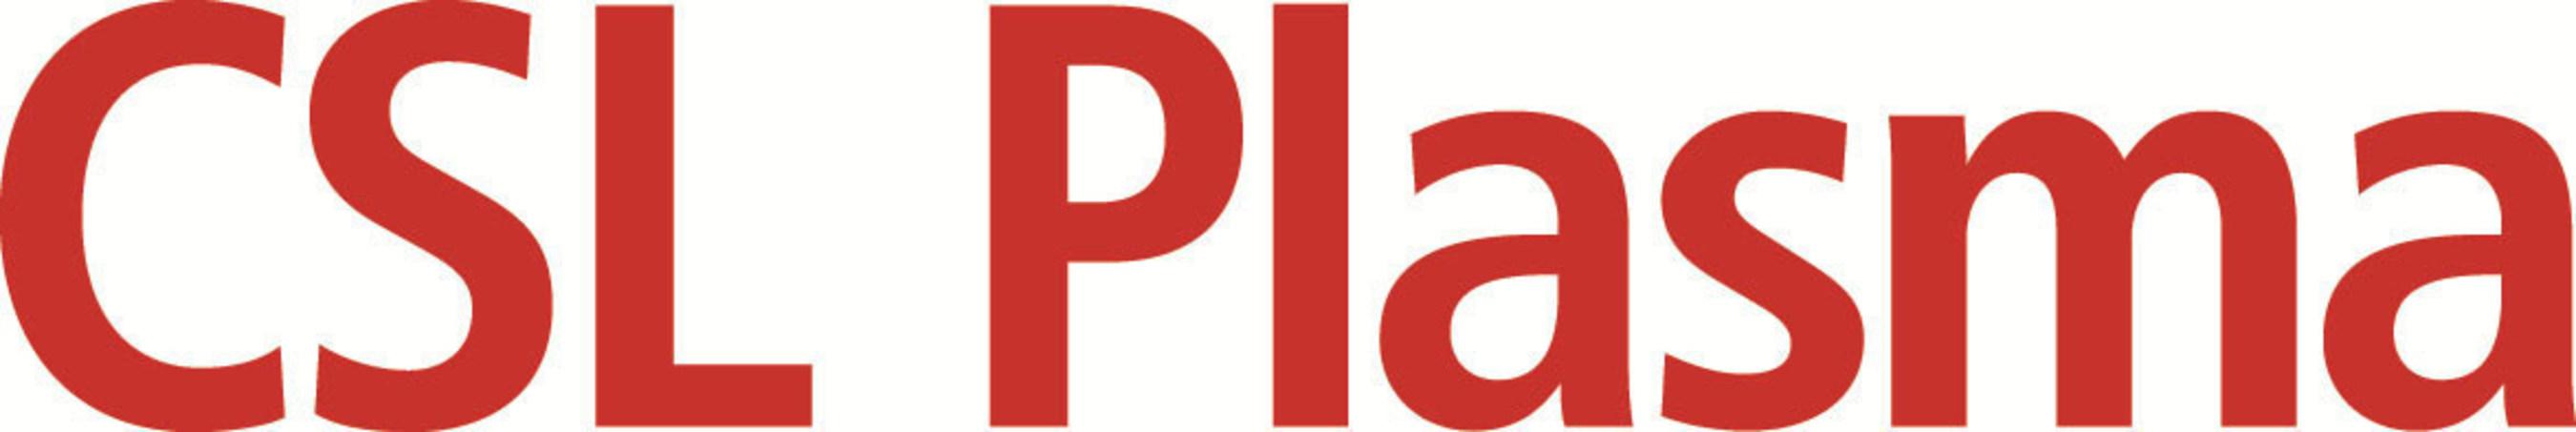 CSL Plasma Logo